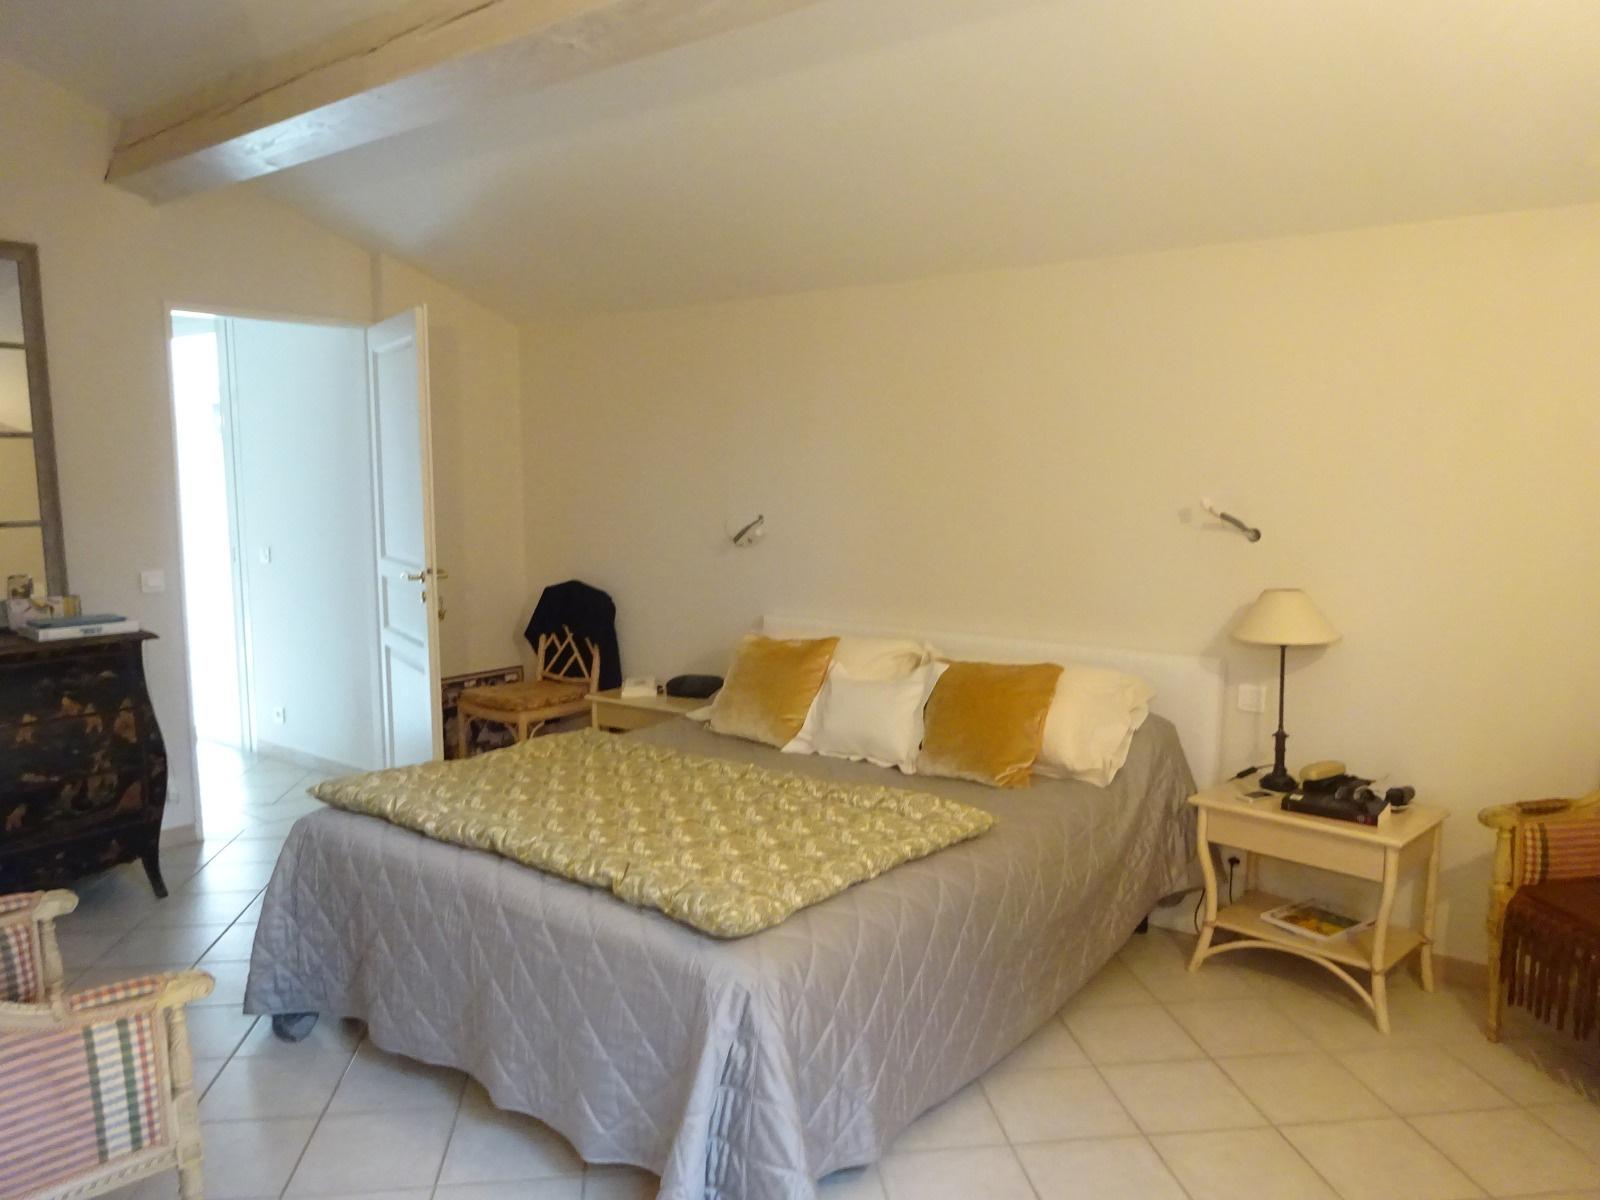 Image_8, Maison / villa, Saint-Cyr-sur-Mer, ref :30870